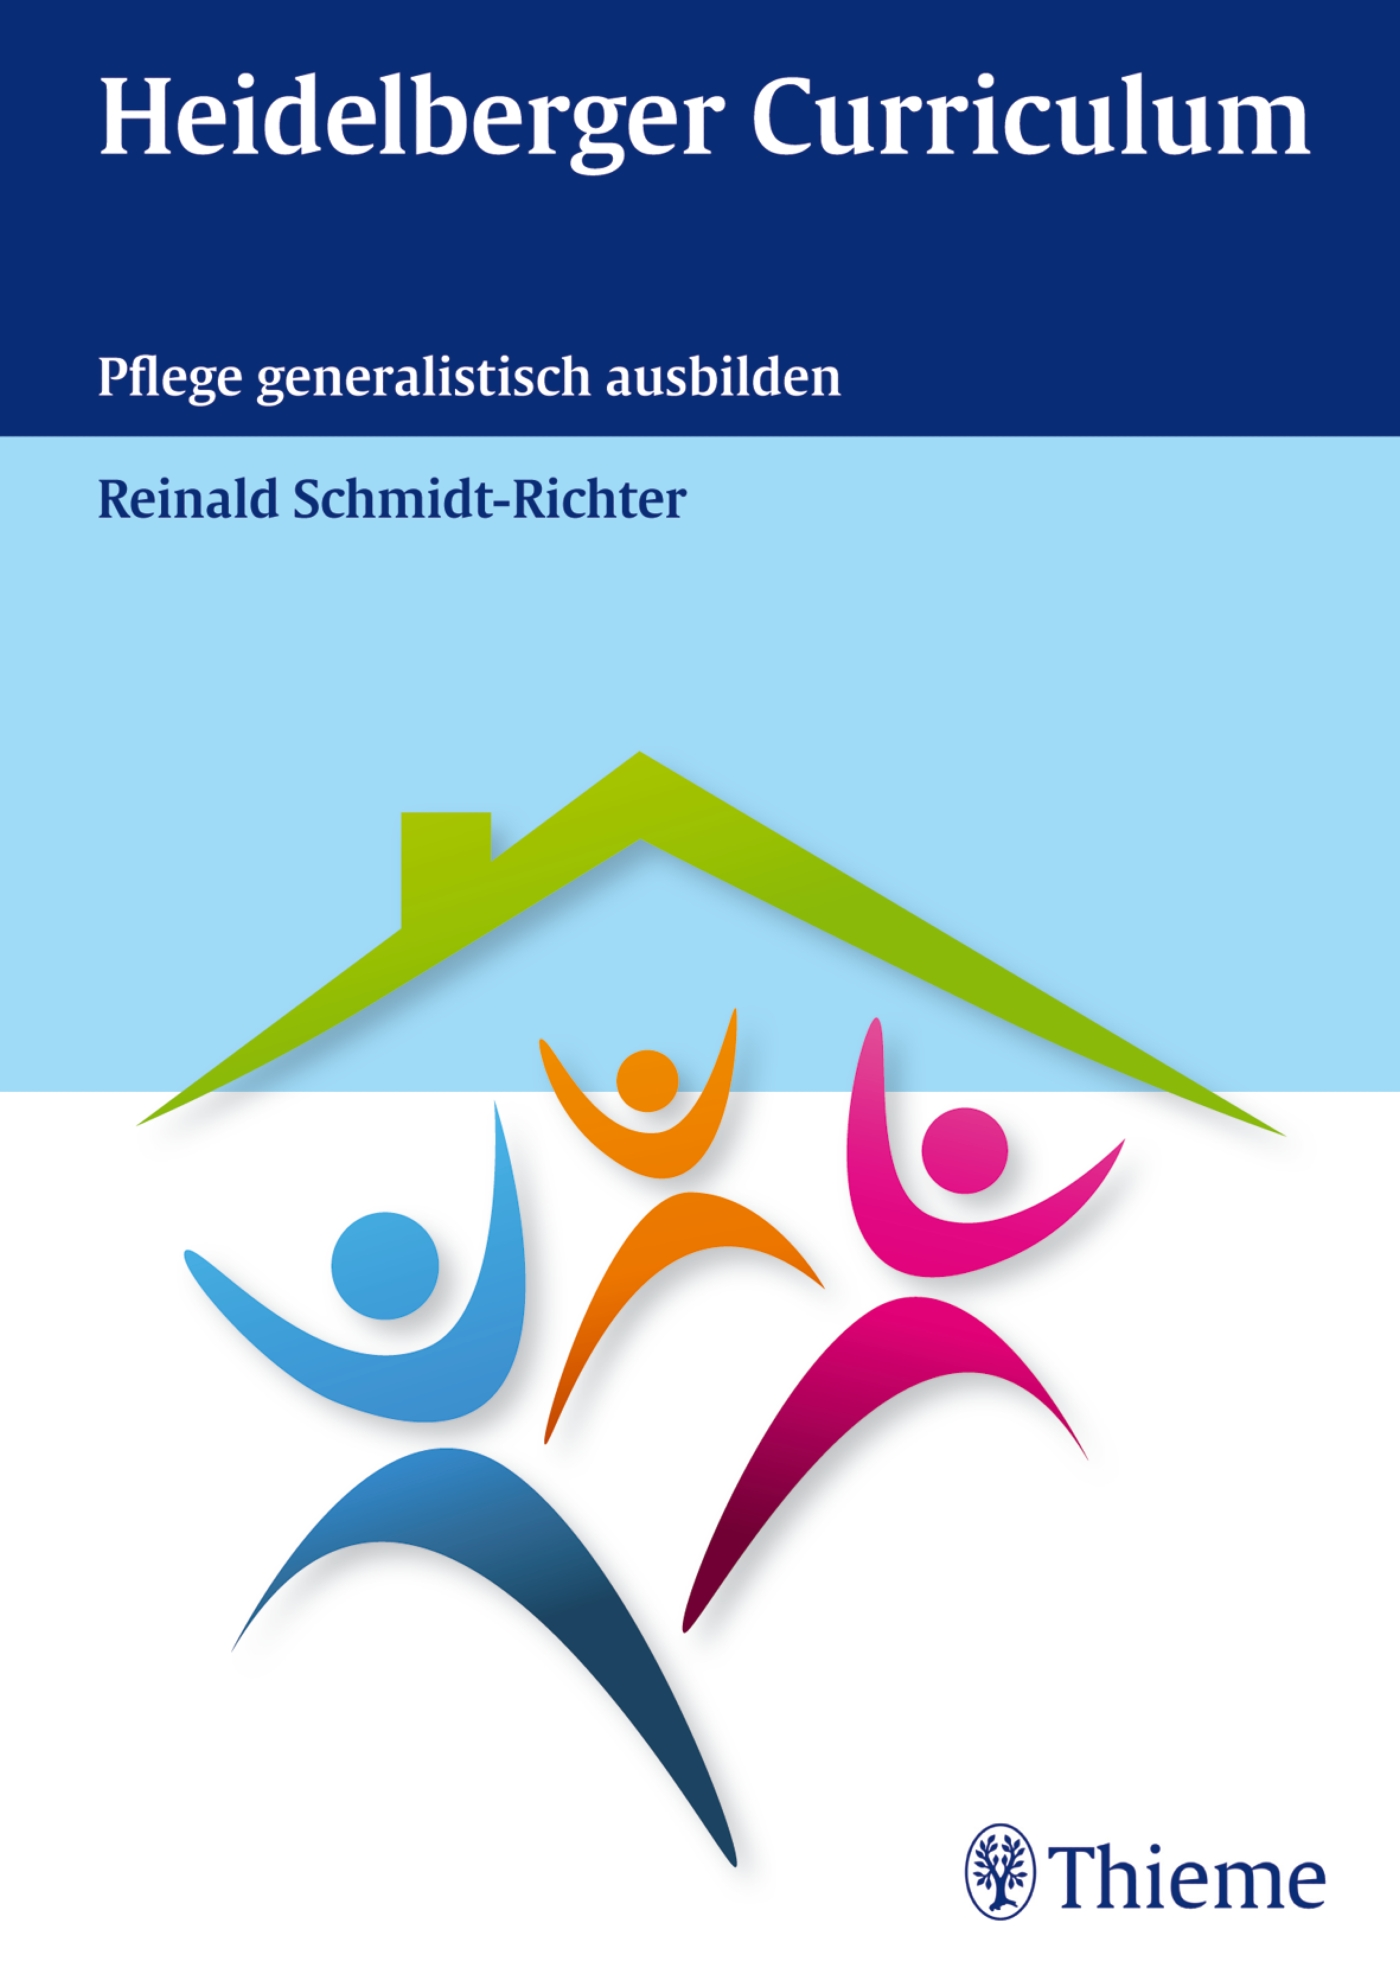 Heidelberger Curriculum